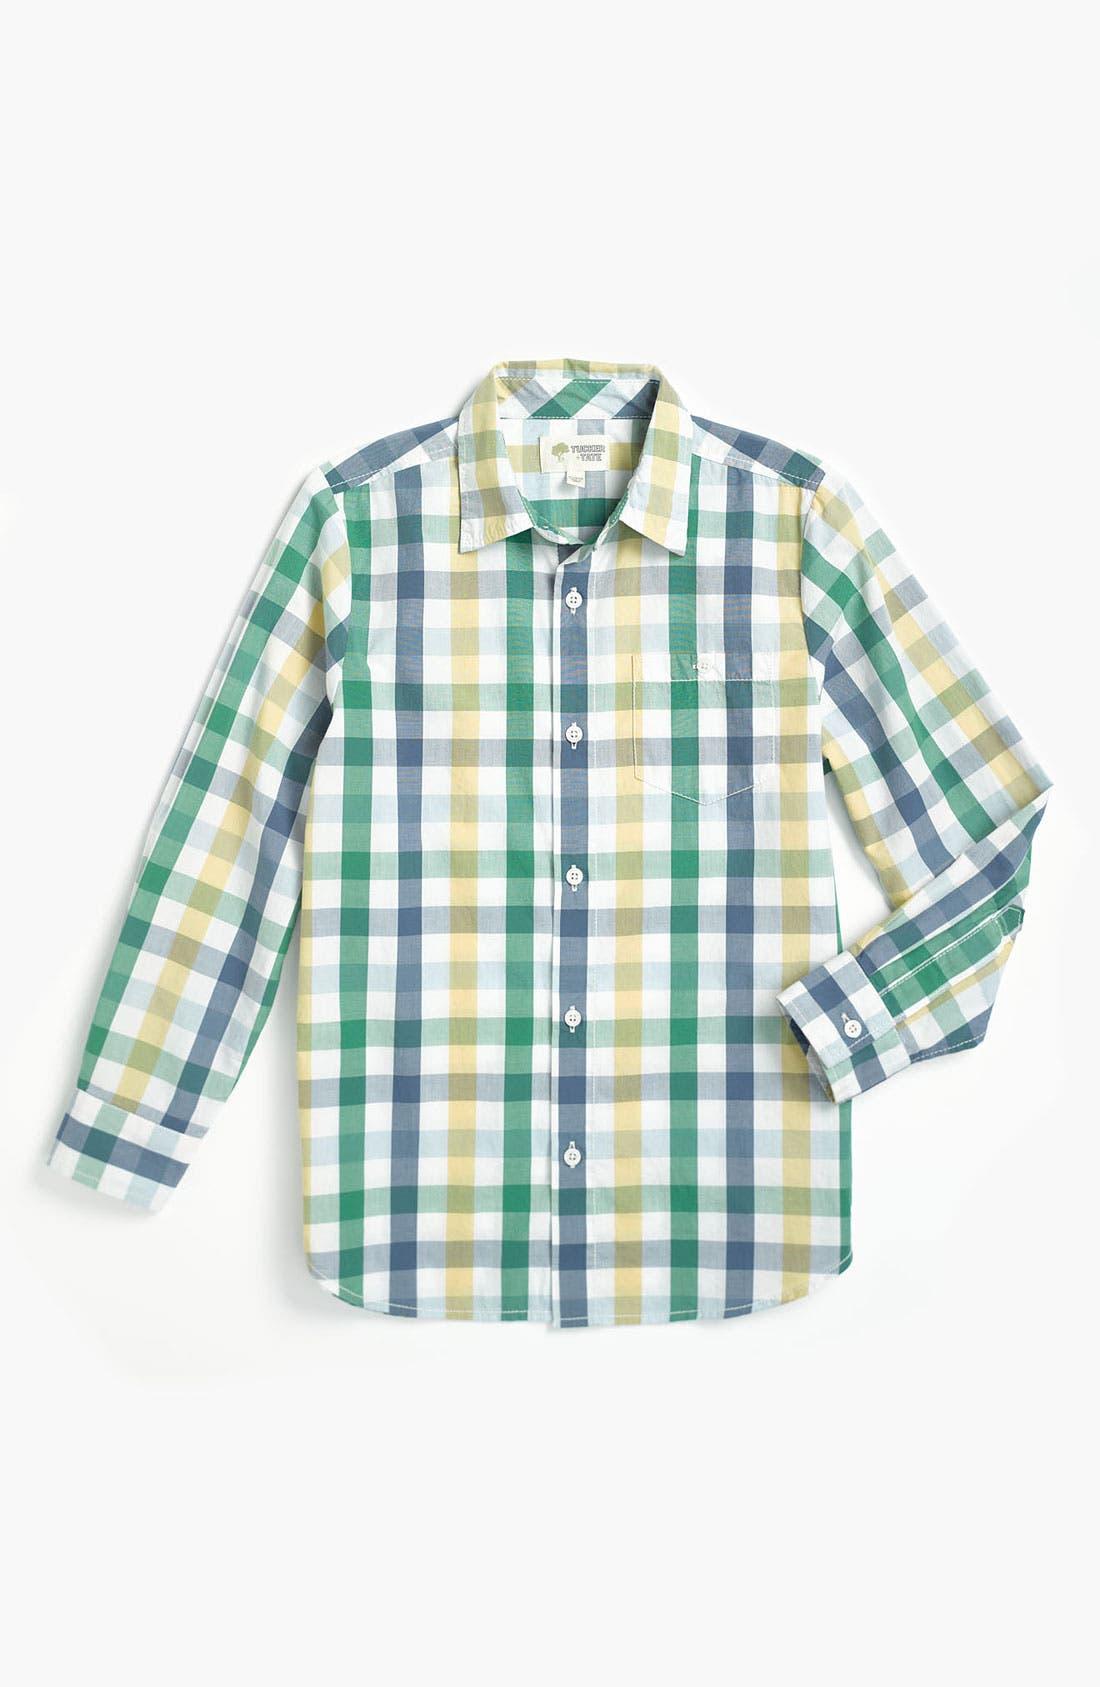 Main Image - Tucker + Tate 'Allister' Poplin Shirt (Big Boys)